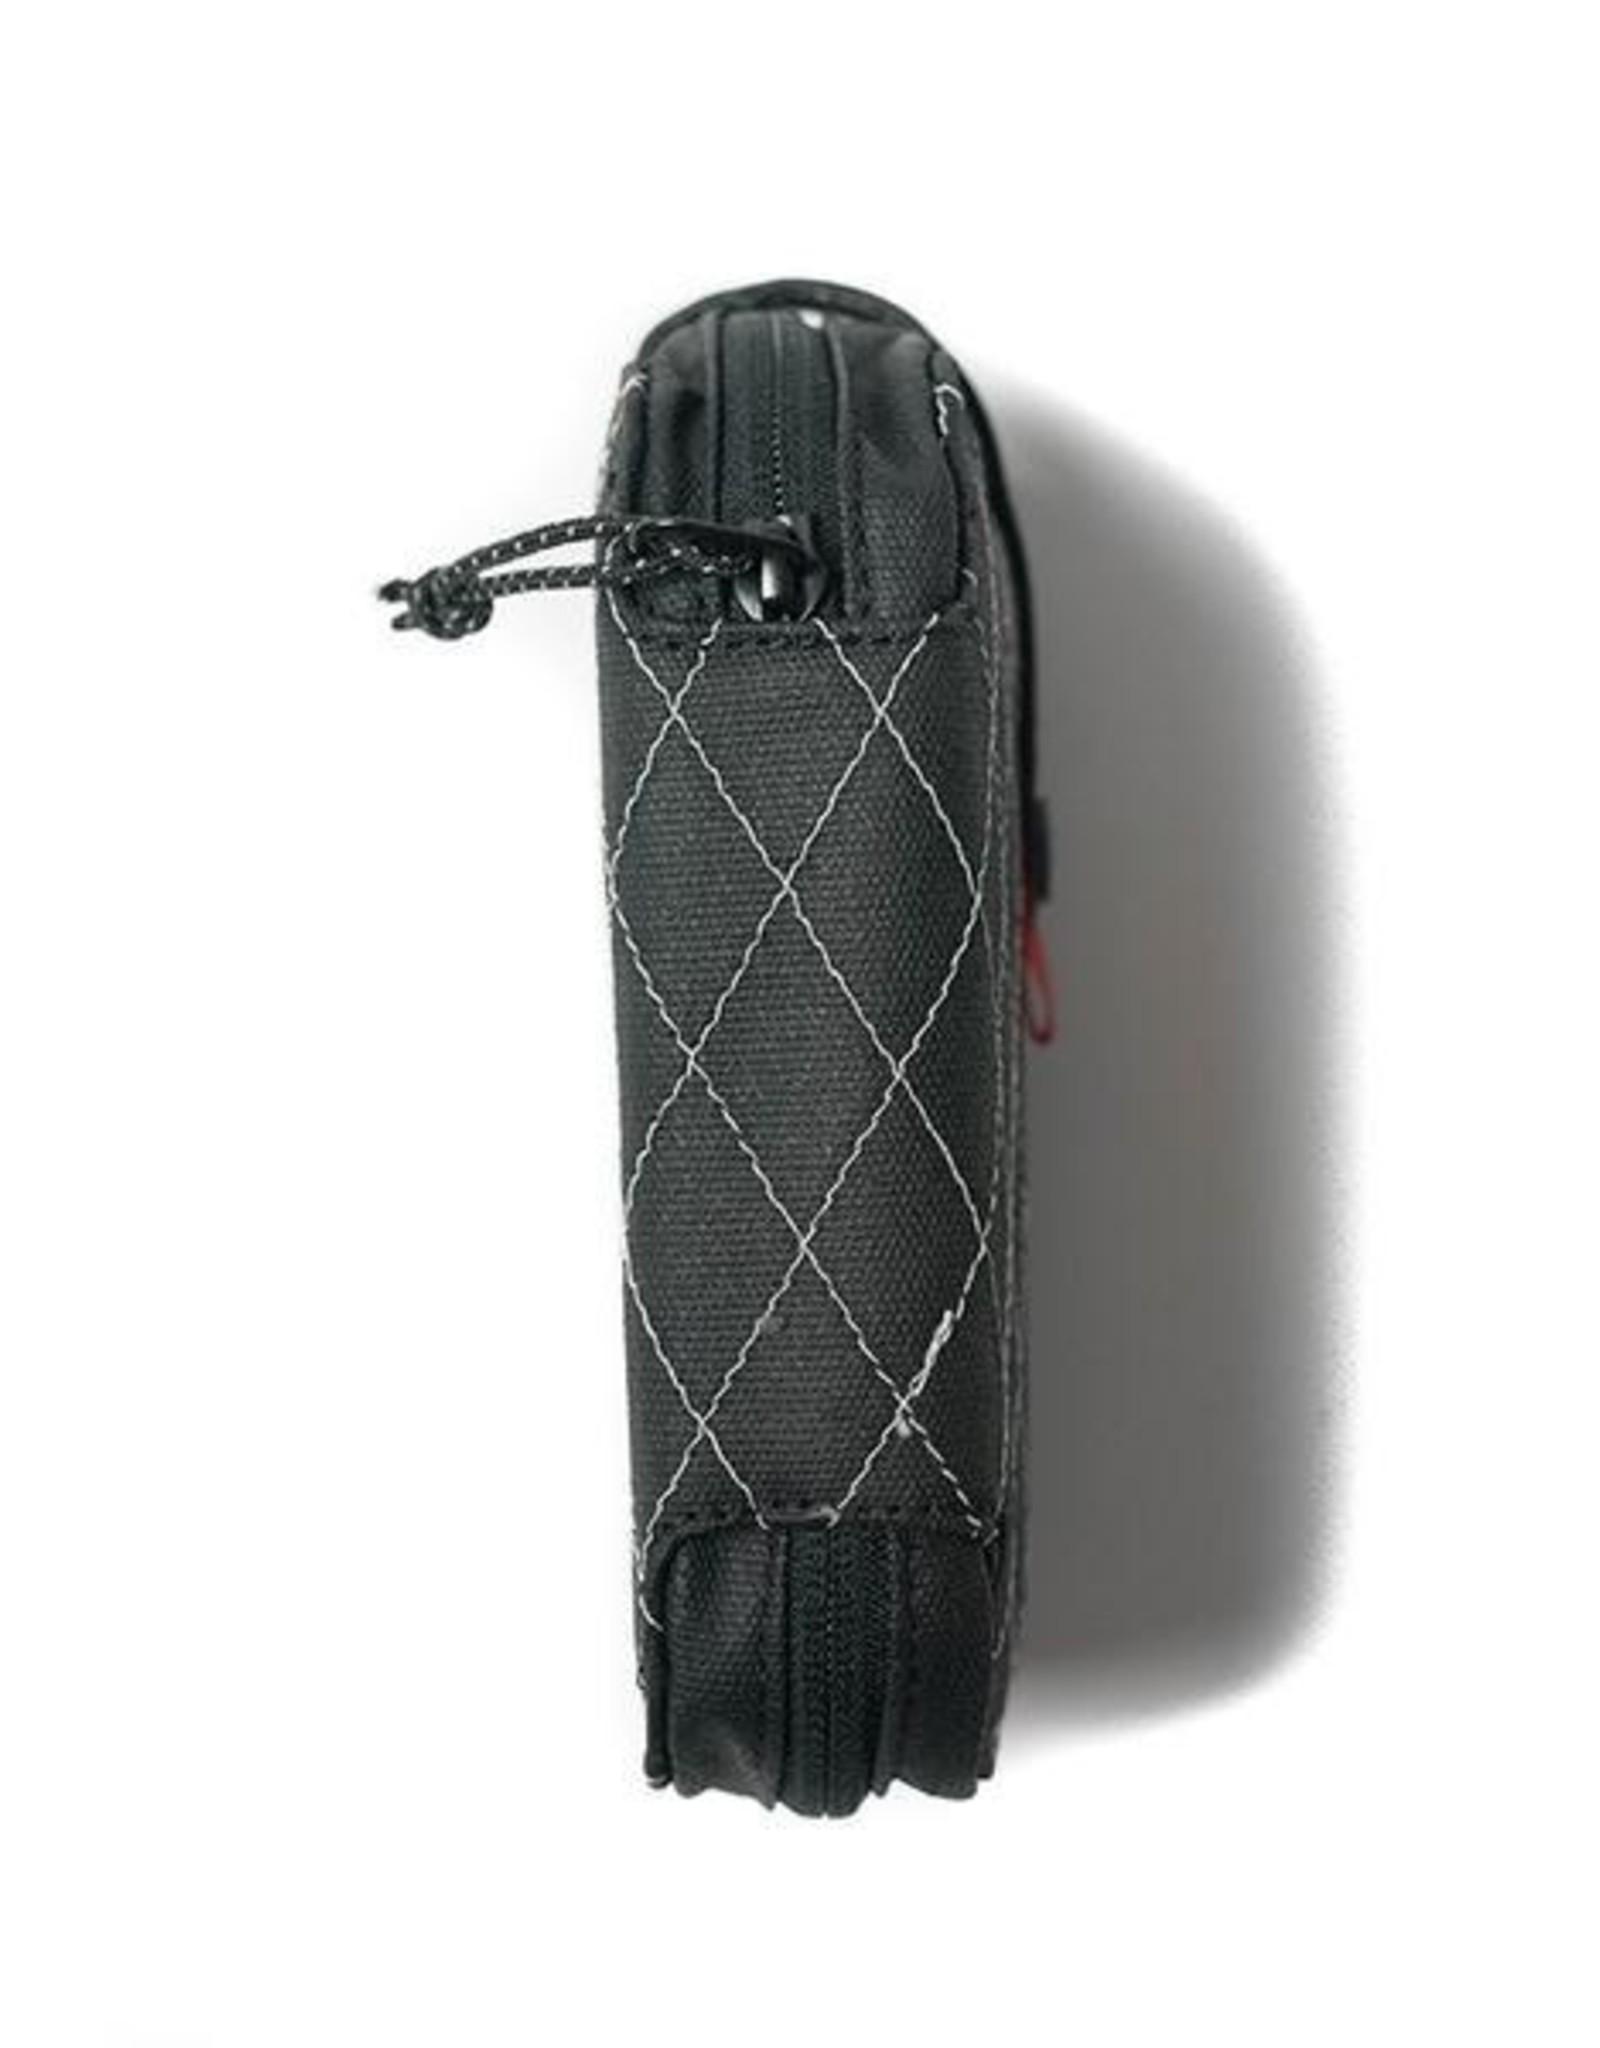 Silca Silca - EOLO wallet loaded